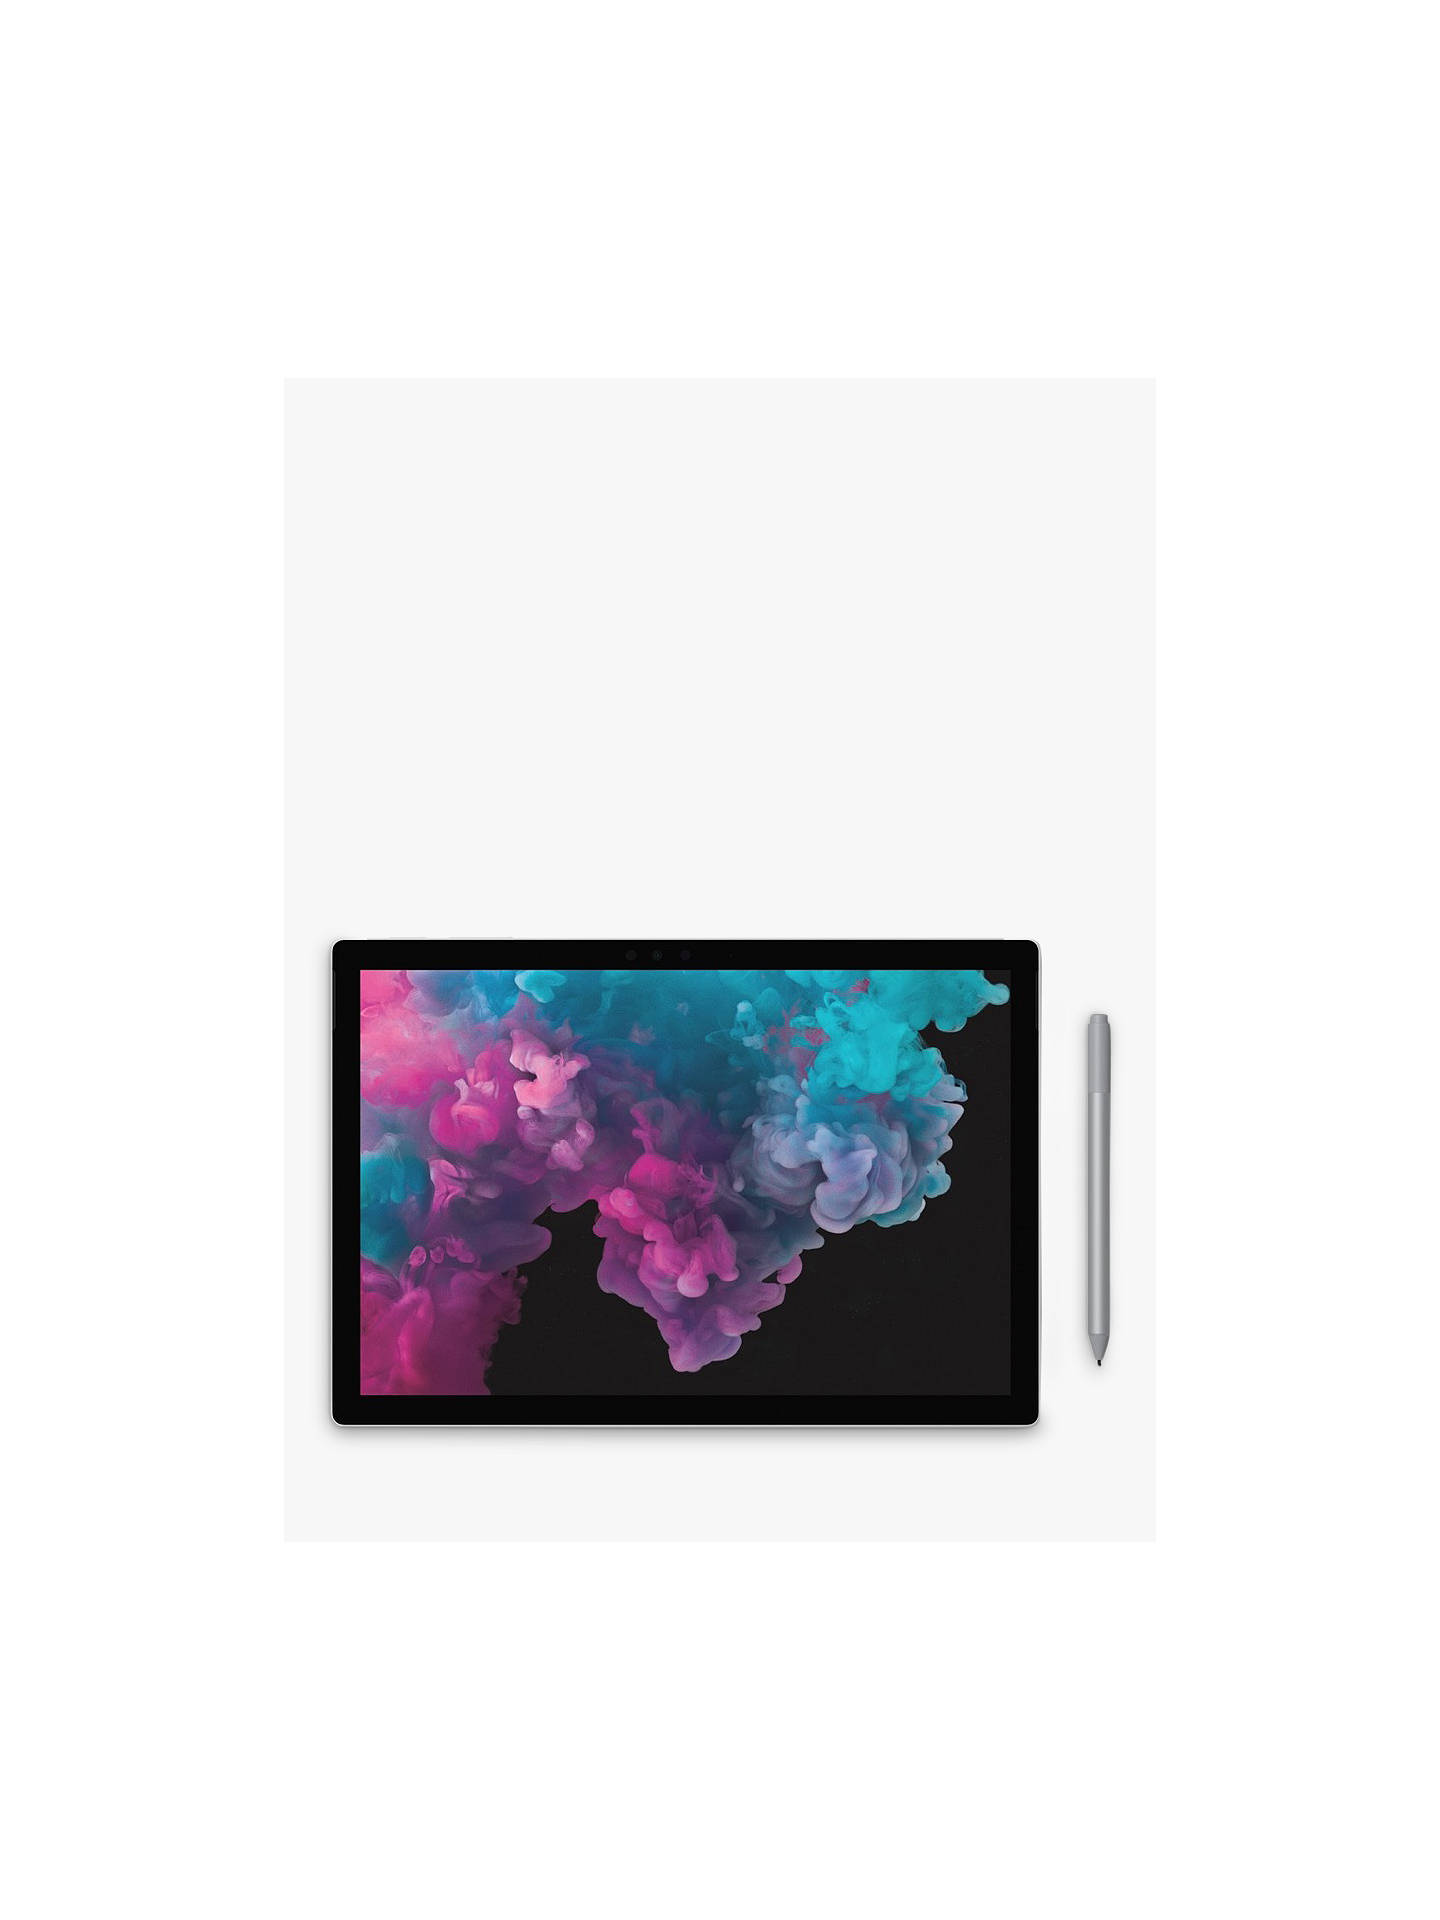 Microsoft Surface Pro 6 Tablet, Intel Core i7, 8GB RAM, 256GB SSD, 12 3